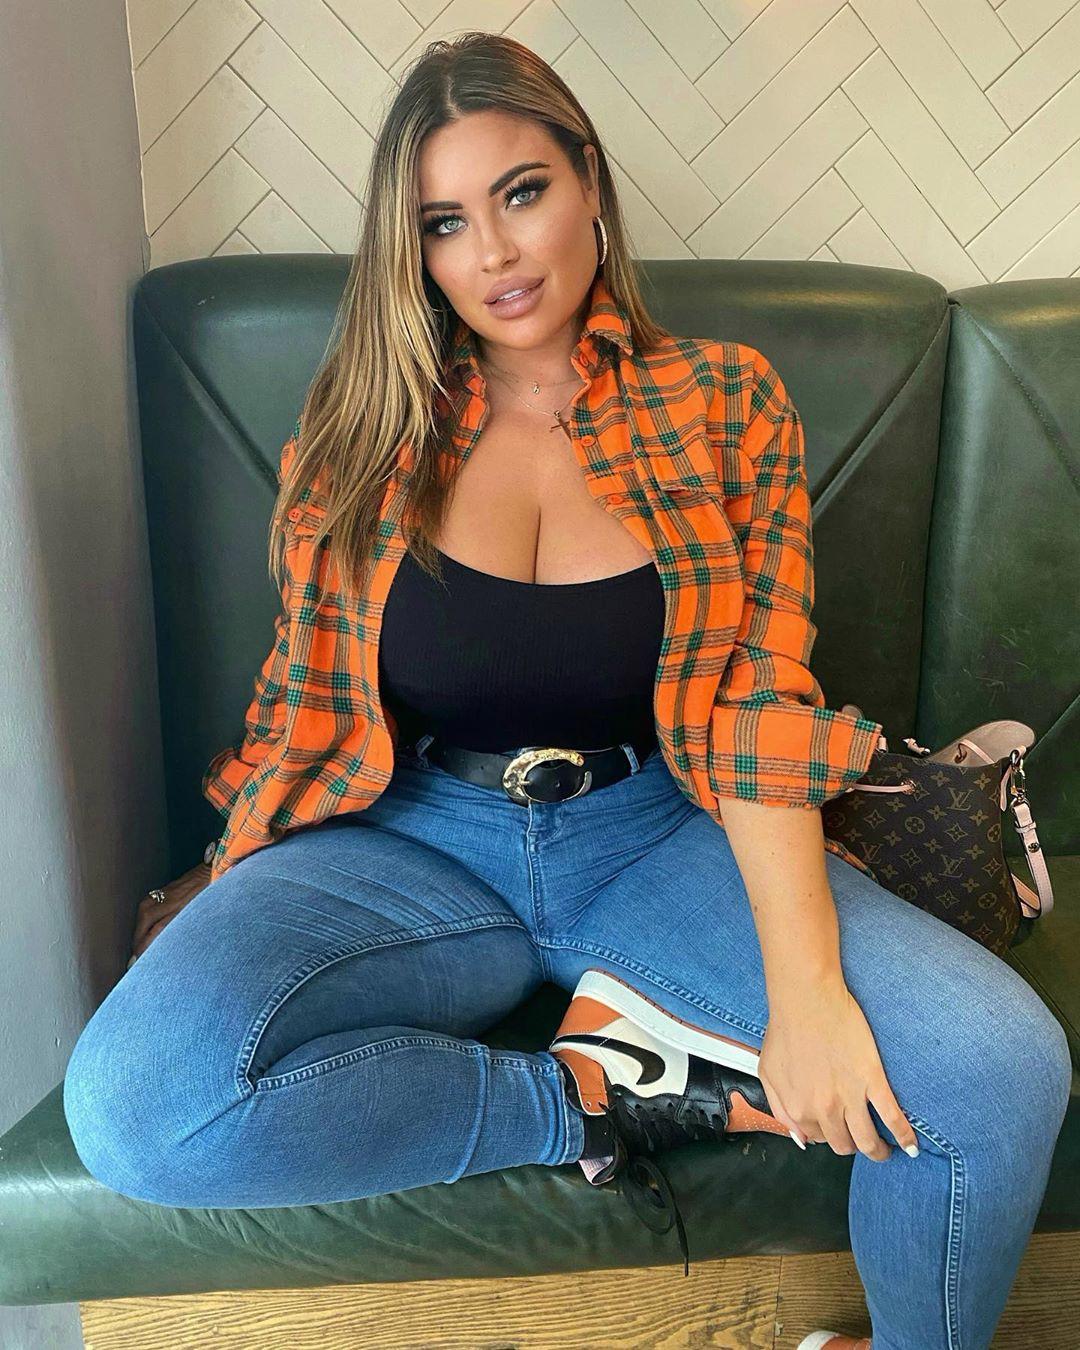 Hannah denim, jeans dress for women, photoshoot ideas